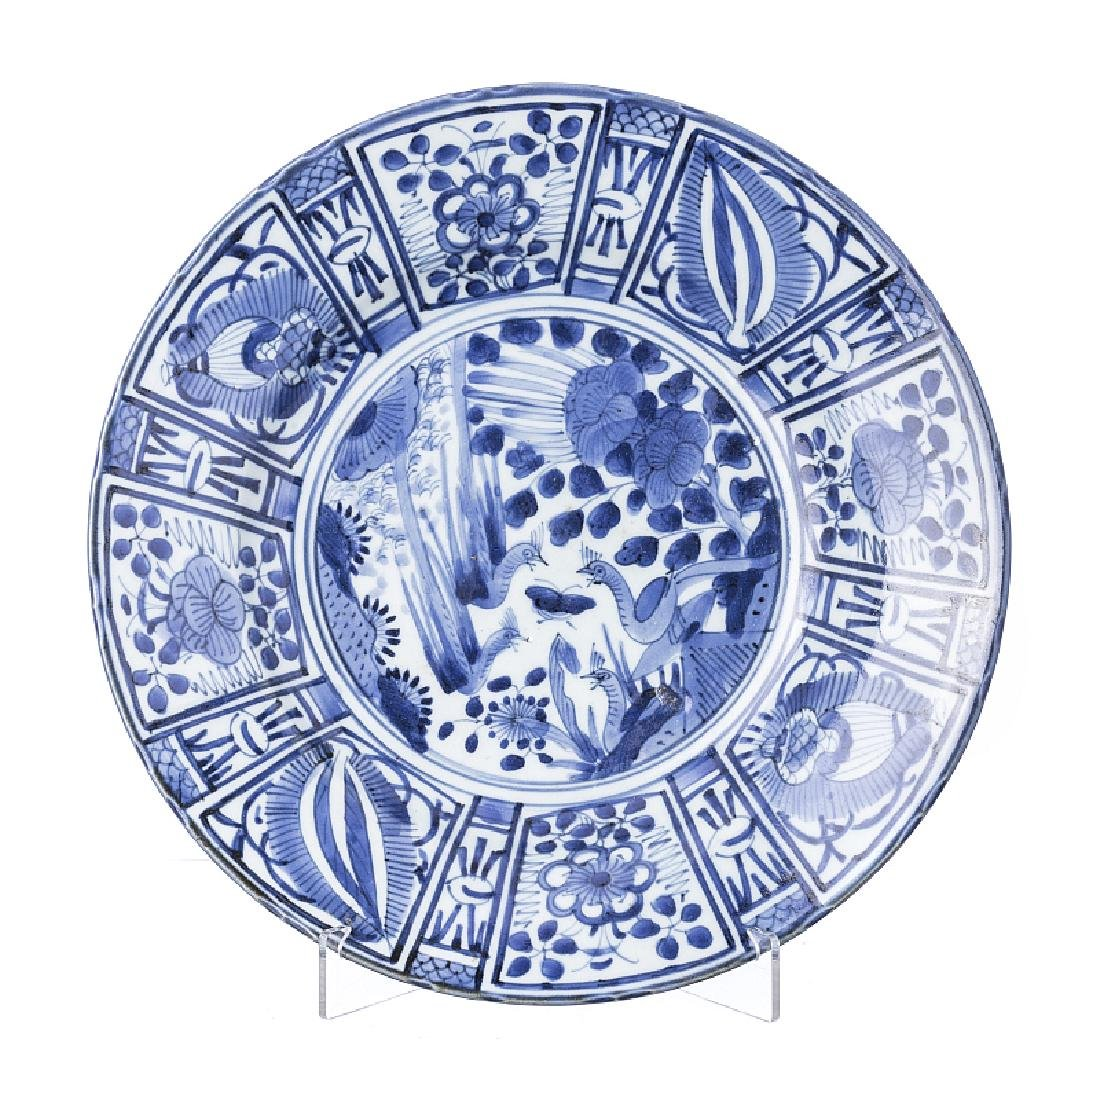 Kraak plate in Japan Porcelain